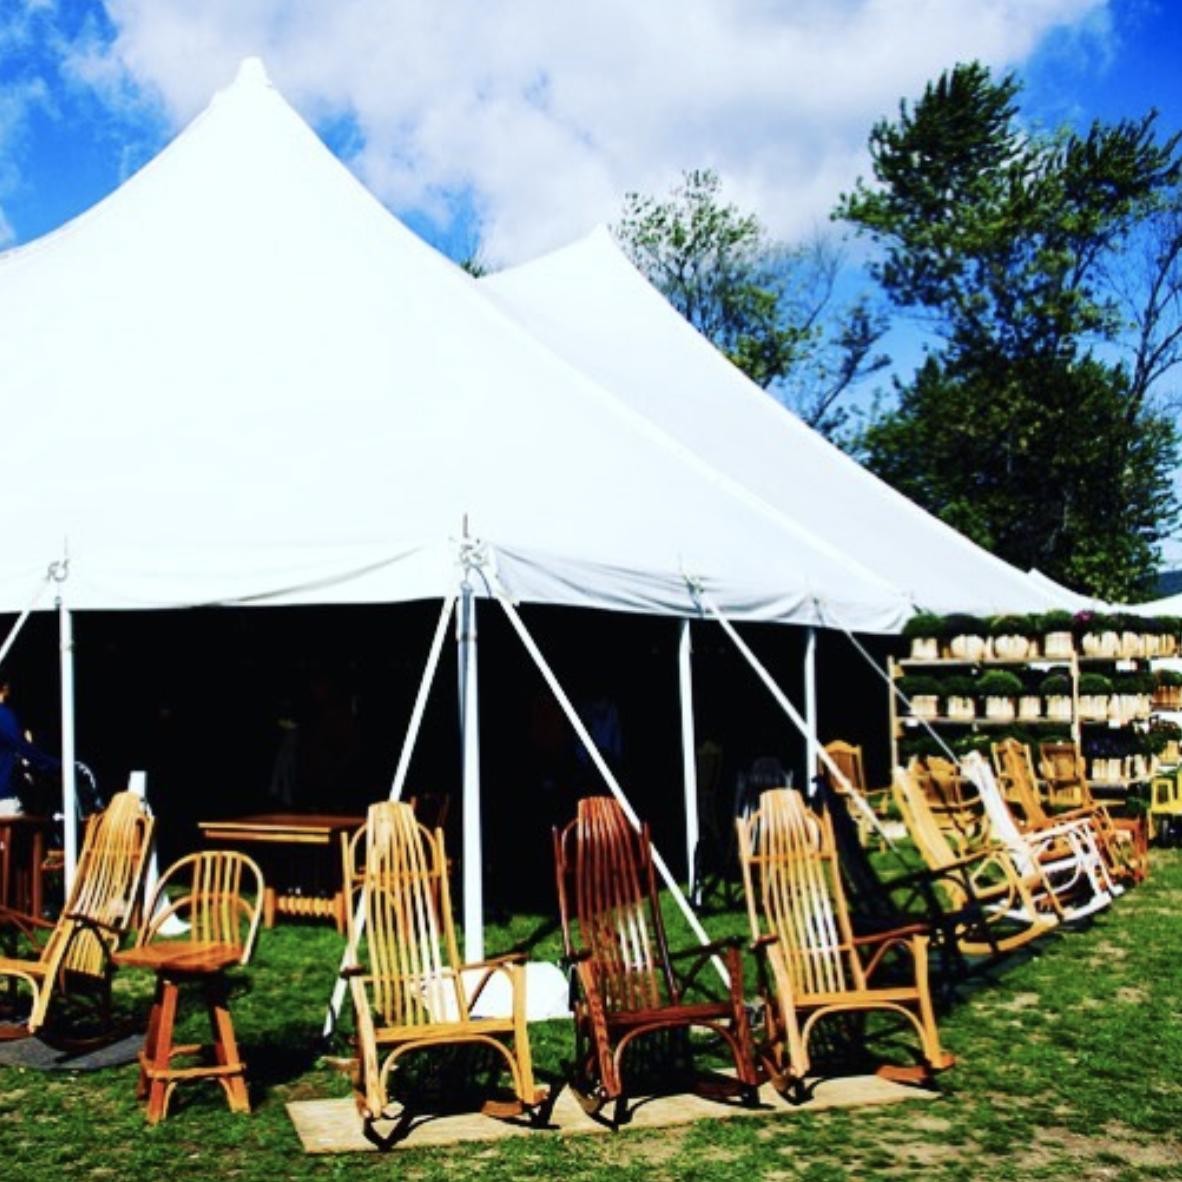 John Finnan Handmade Adirondack Chairs at the Woodstock-New Paltz Art & Crafts Fair